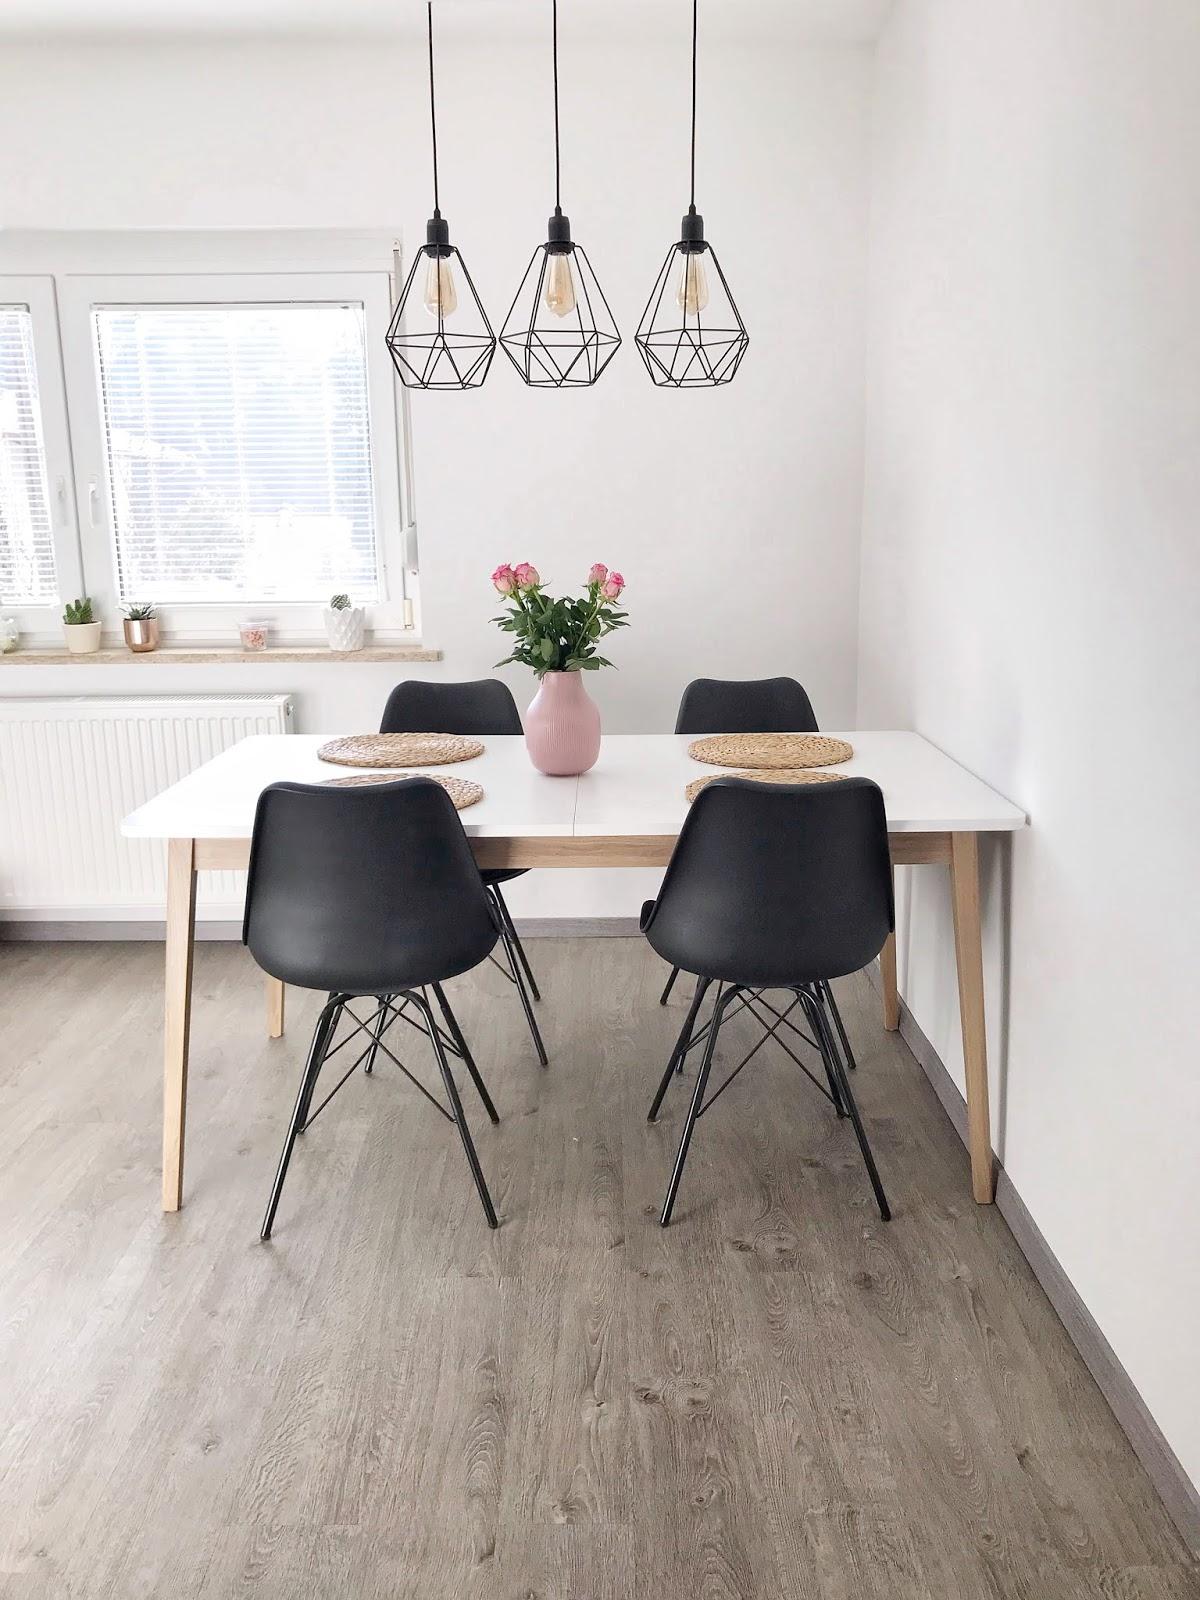 jedilnica, kuhinja, prenova jedilnice, kitchen, dinning room